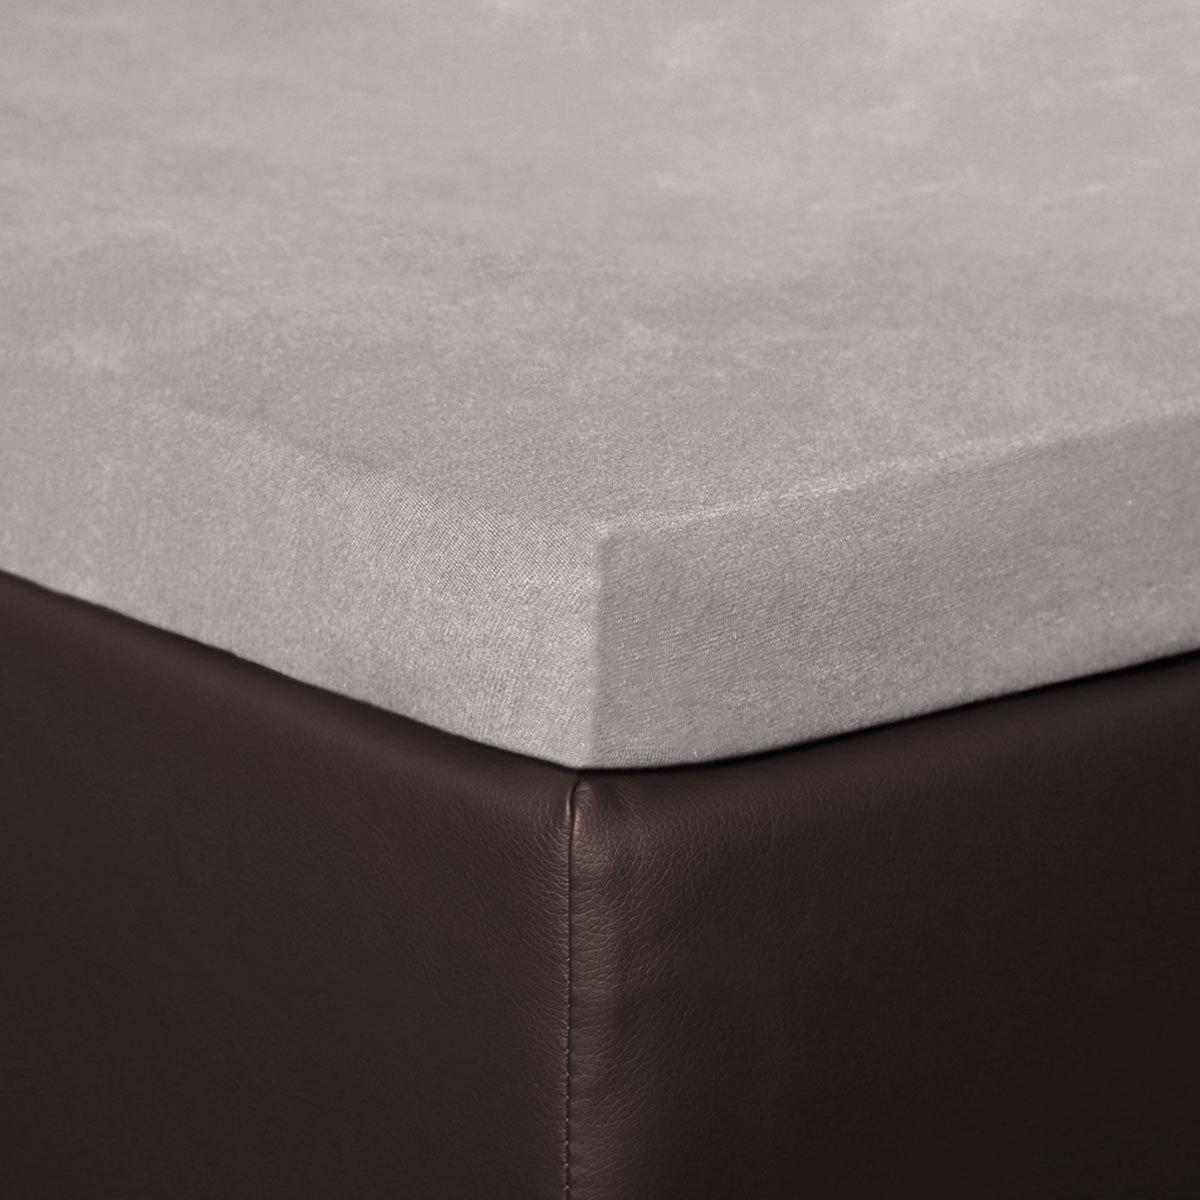 bettwarenshop boxspring topper spannbettlaken h he 5 cm g nstig online kaufen bei bettwaren shop. Black Bedroom Furniture Sets. Home Design Ideas